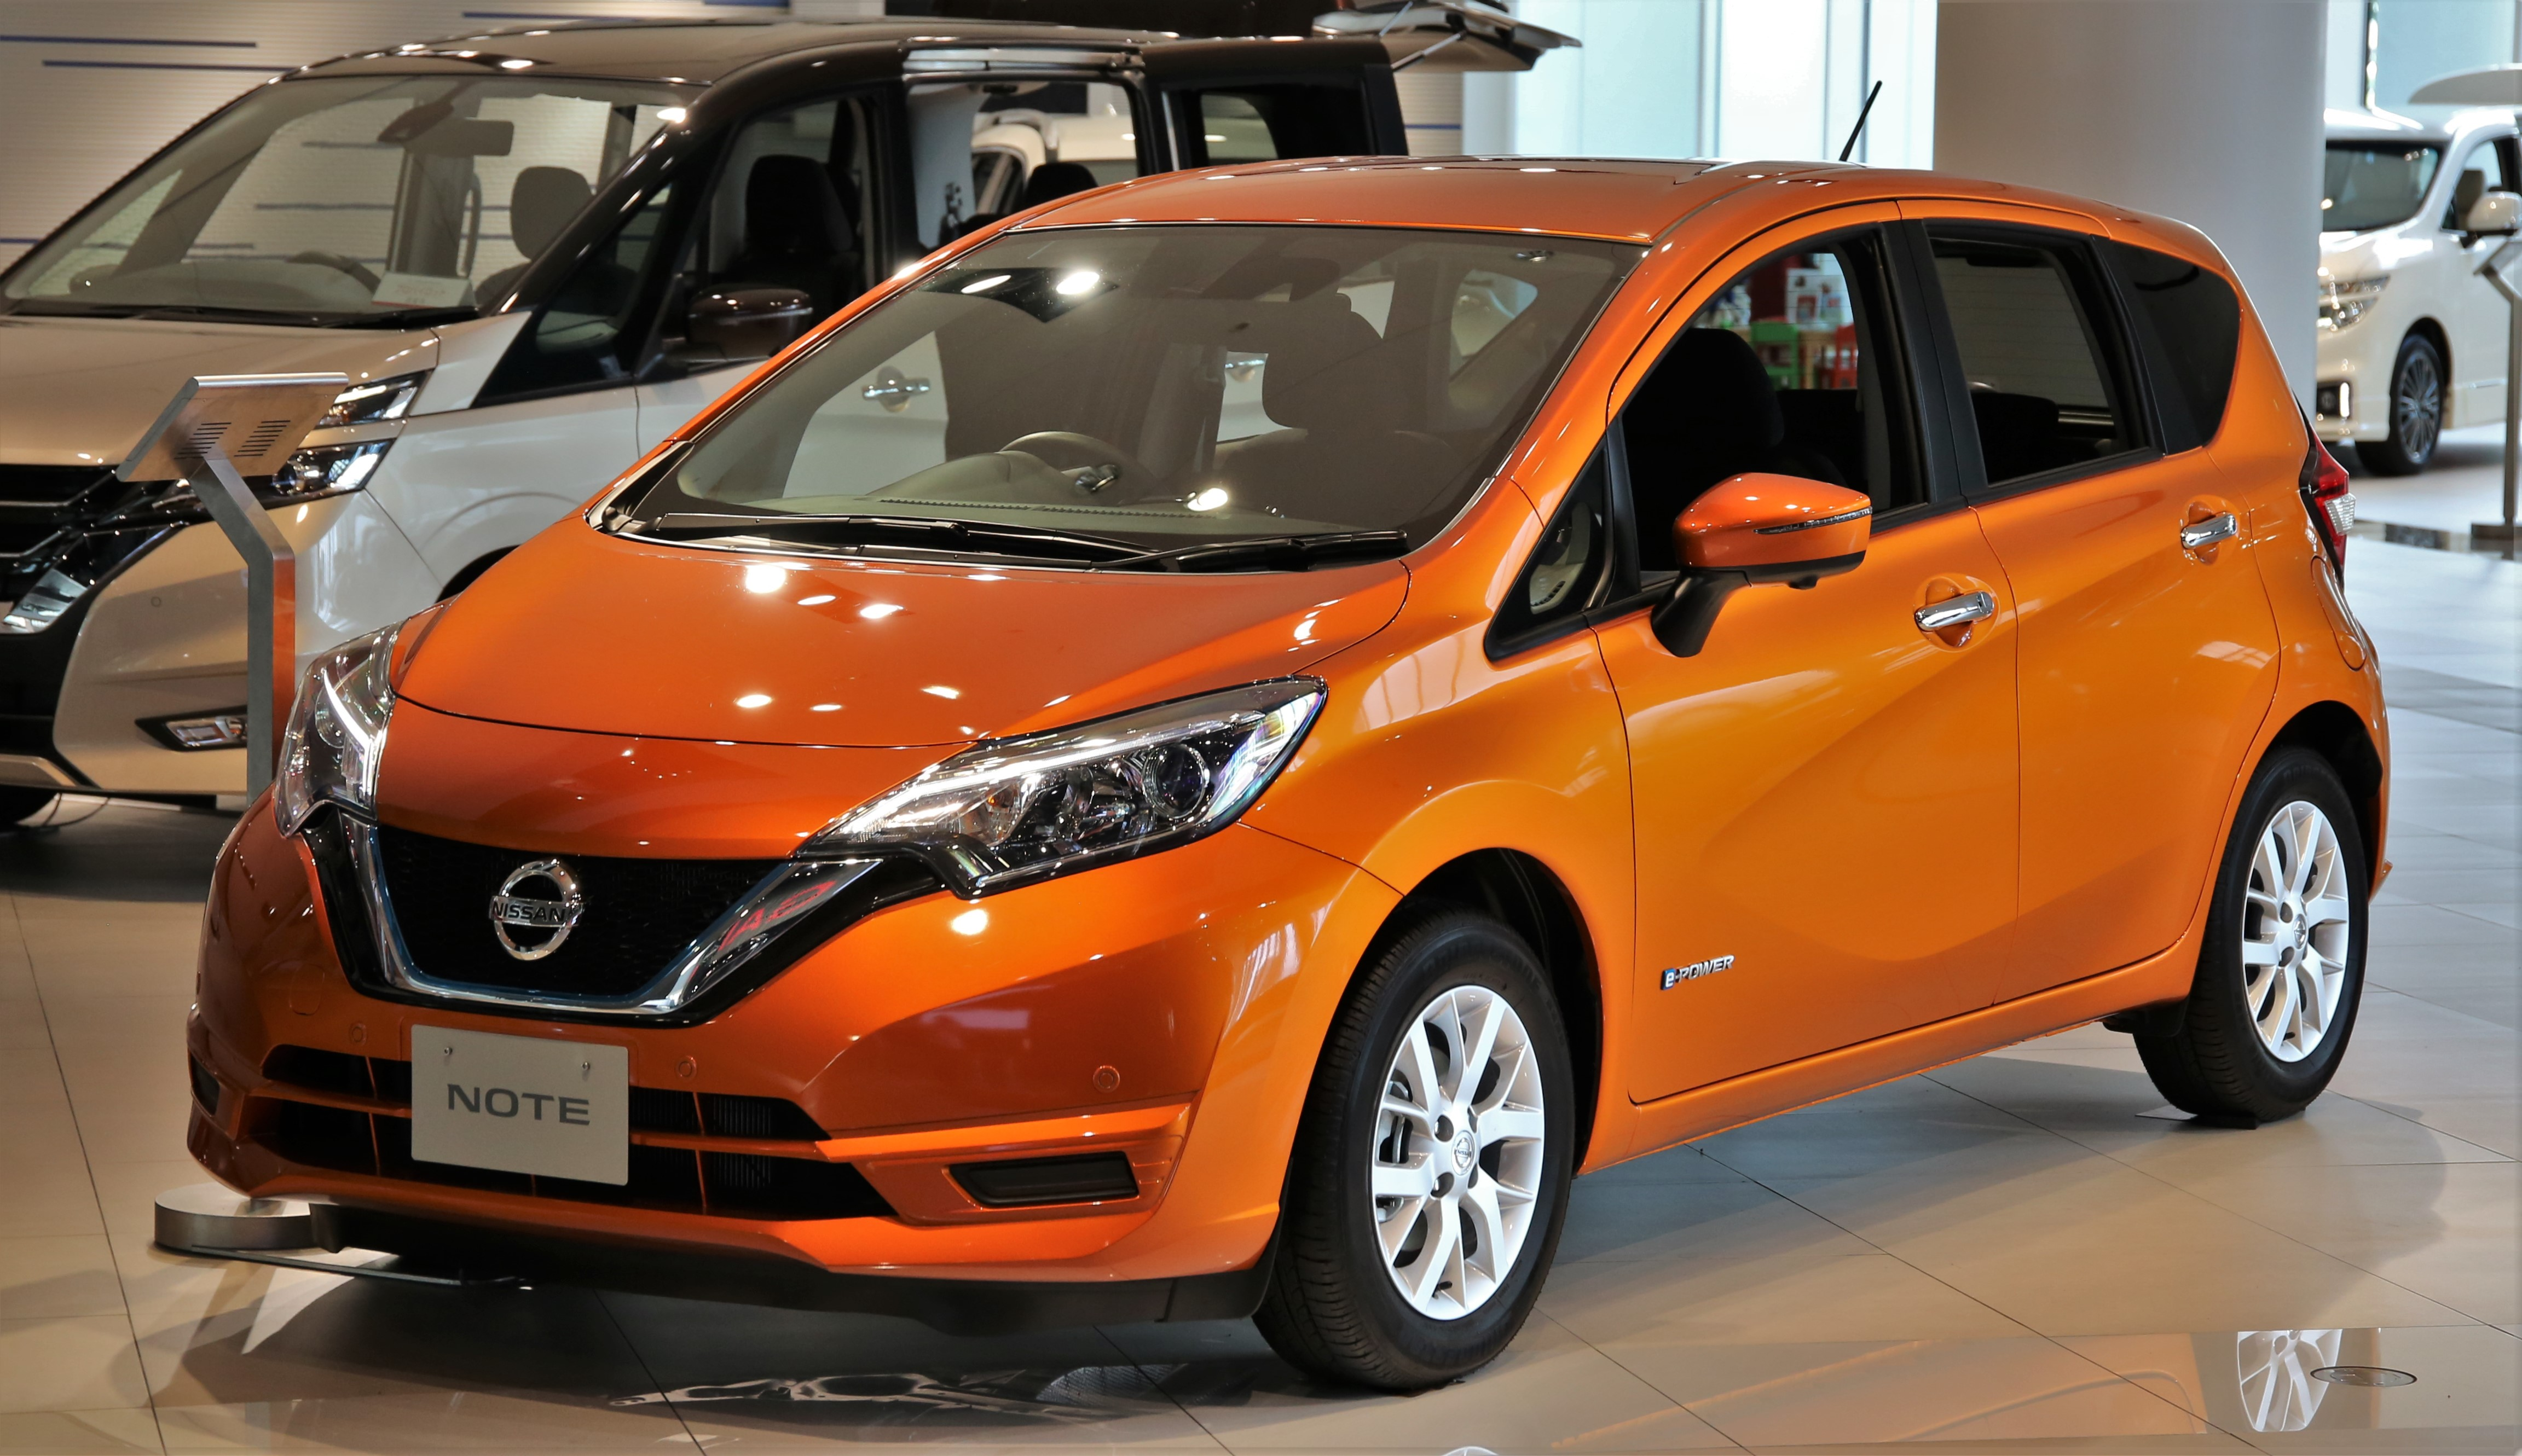 File:Nissan Note e-POWER X.jpg - Wikimedia Commons